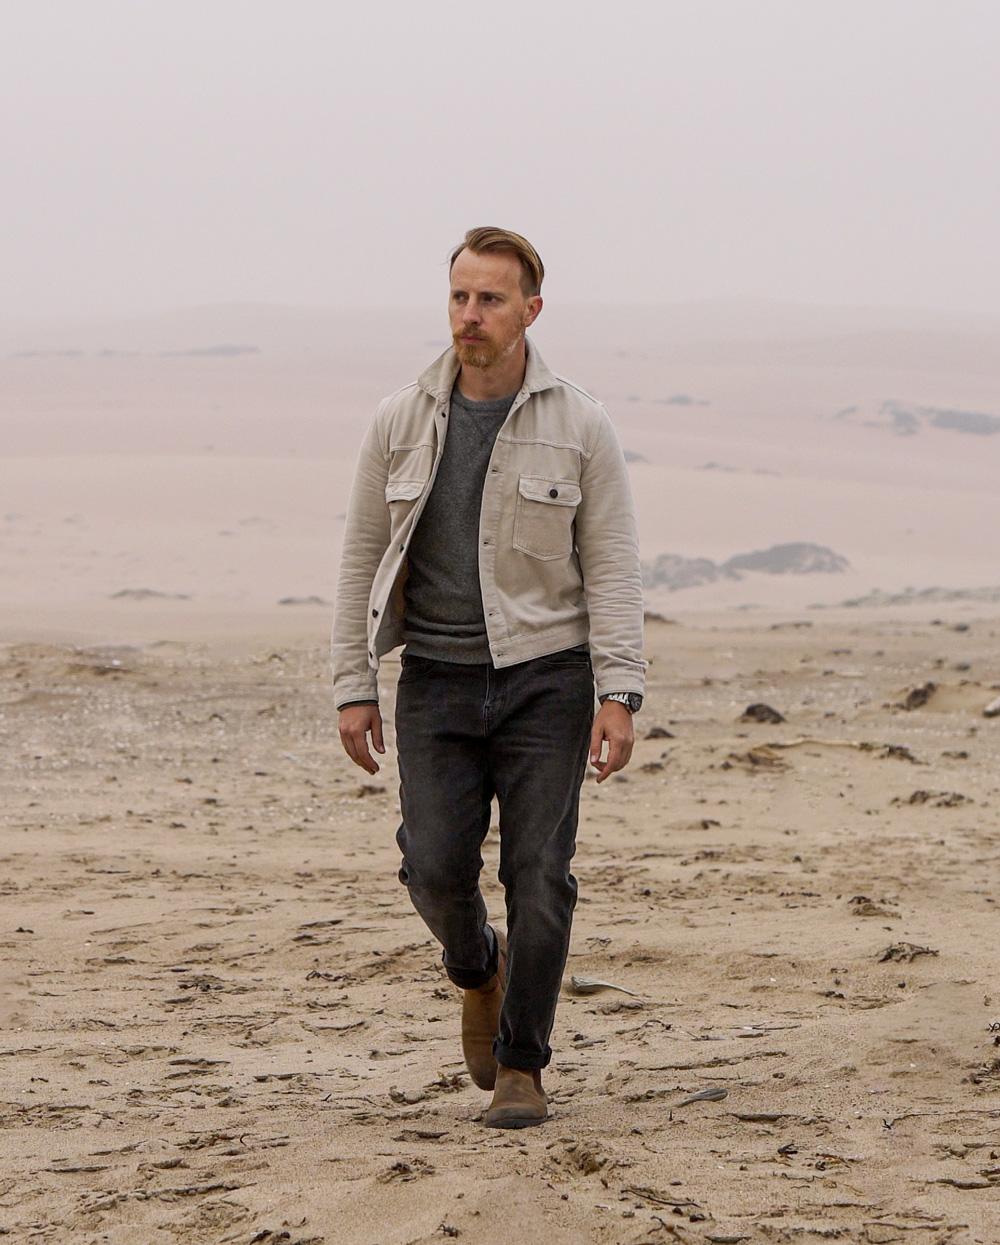 man in desert wearing Buck Mason trucker jacket, J.Crew gray sweatshirt, Goodthreads jeans, Thursday boots